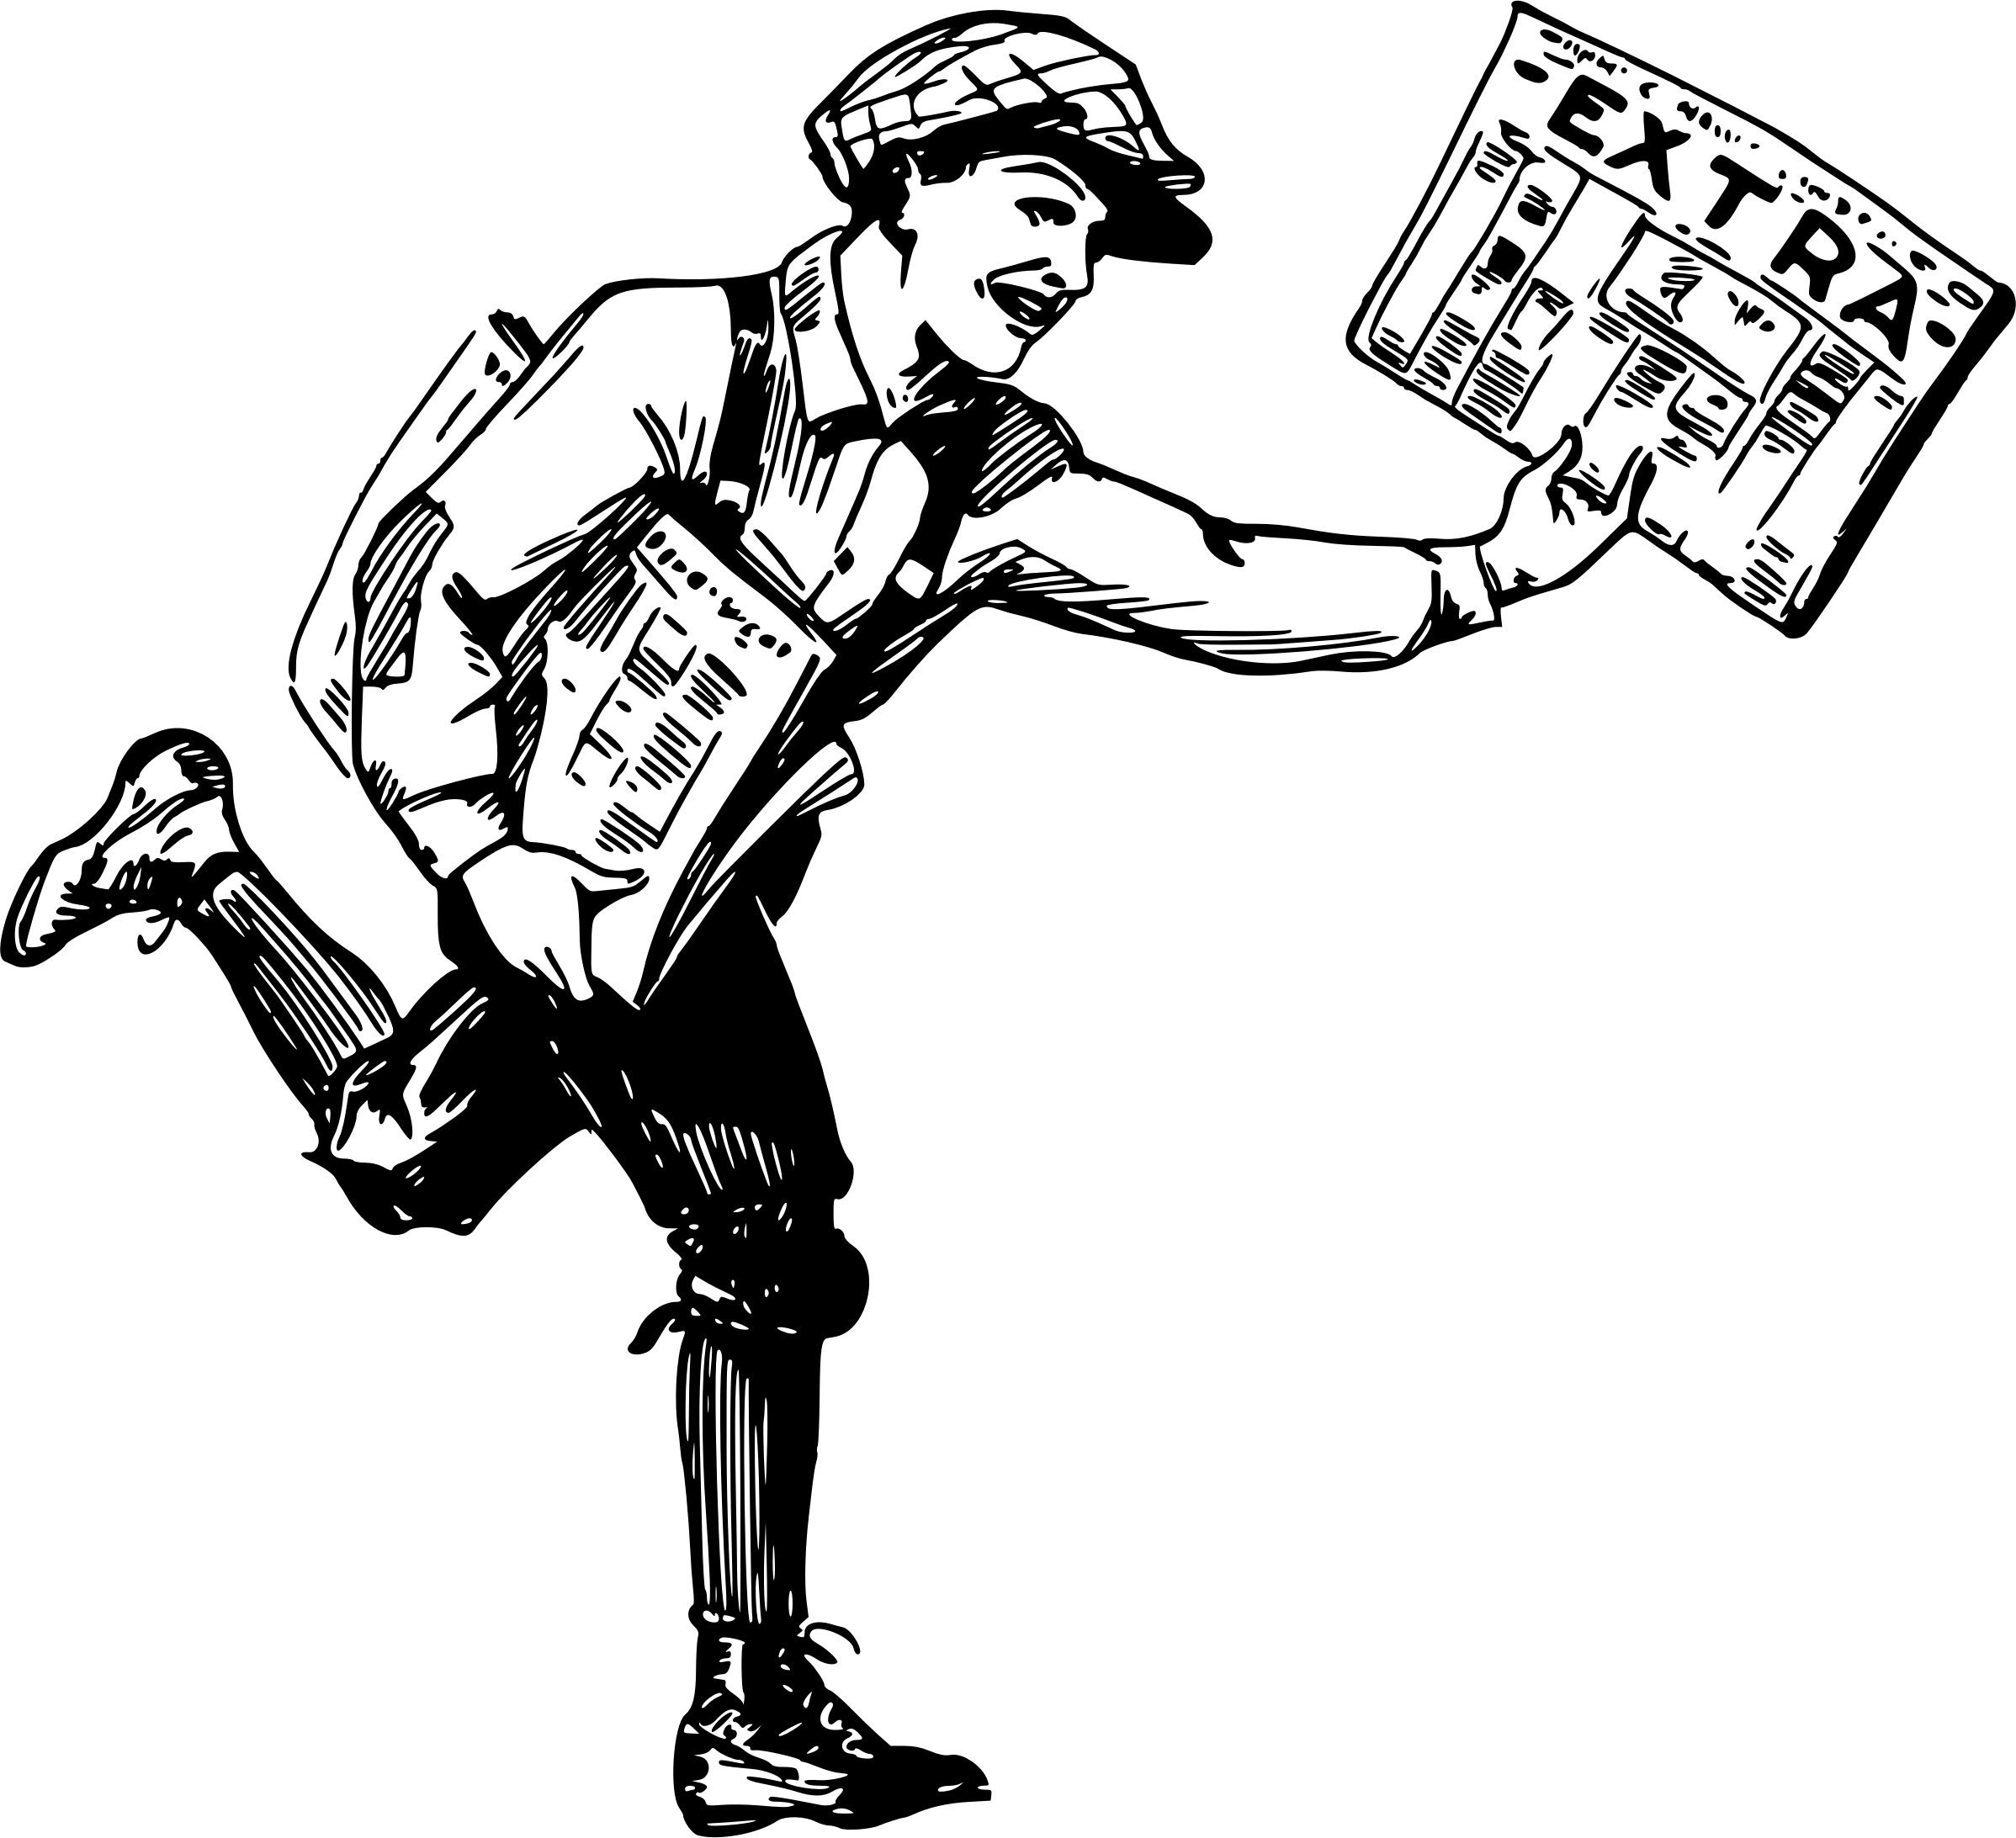 clipart-newsie-transparent